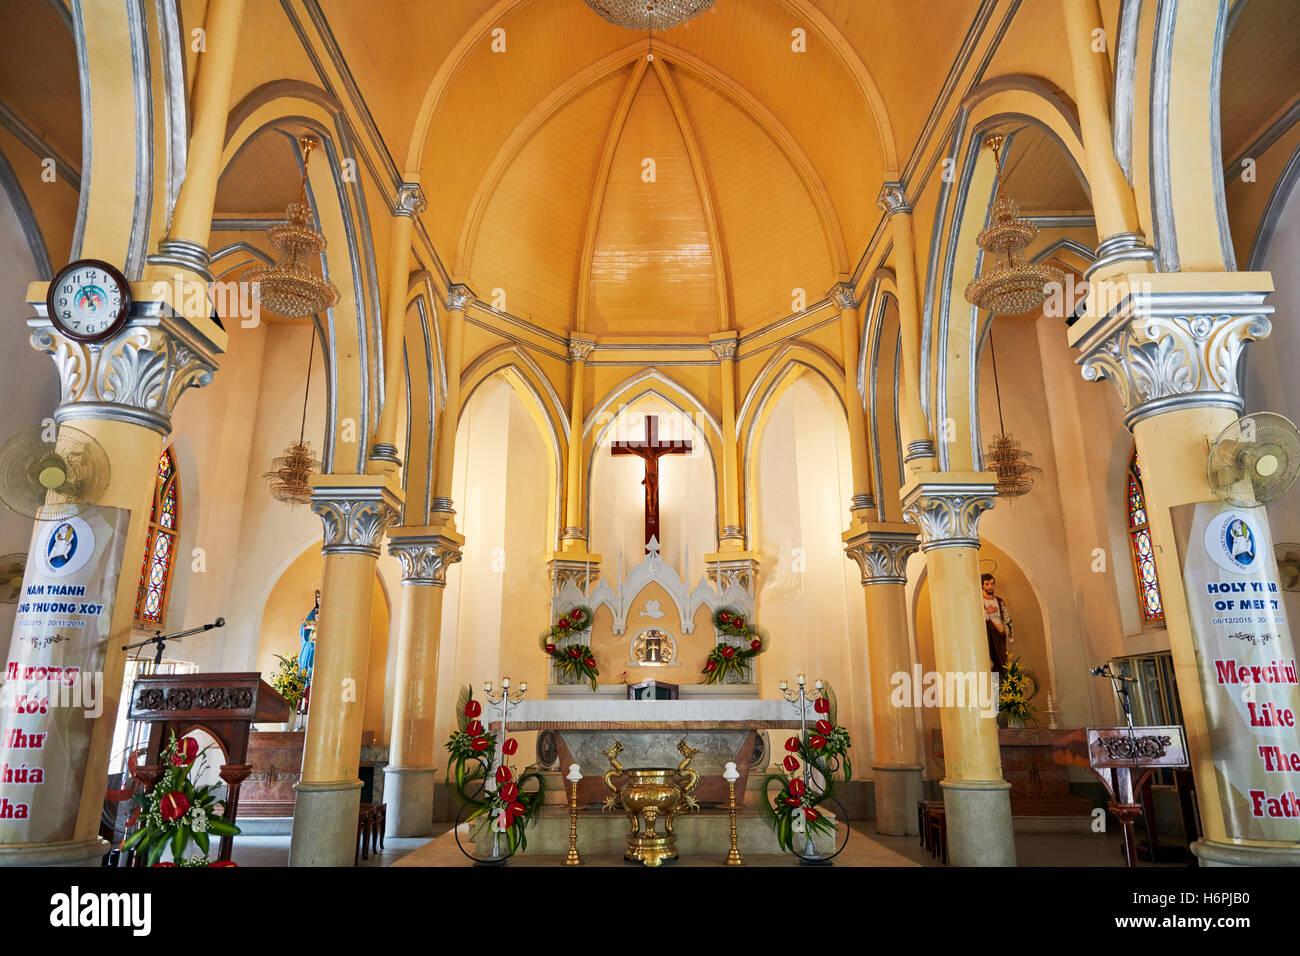 Interior view of the Da Nang Cathedral (Basilica of the Sacred Heart of Jesus). Da Nang city, Vietnam. - Stock Image